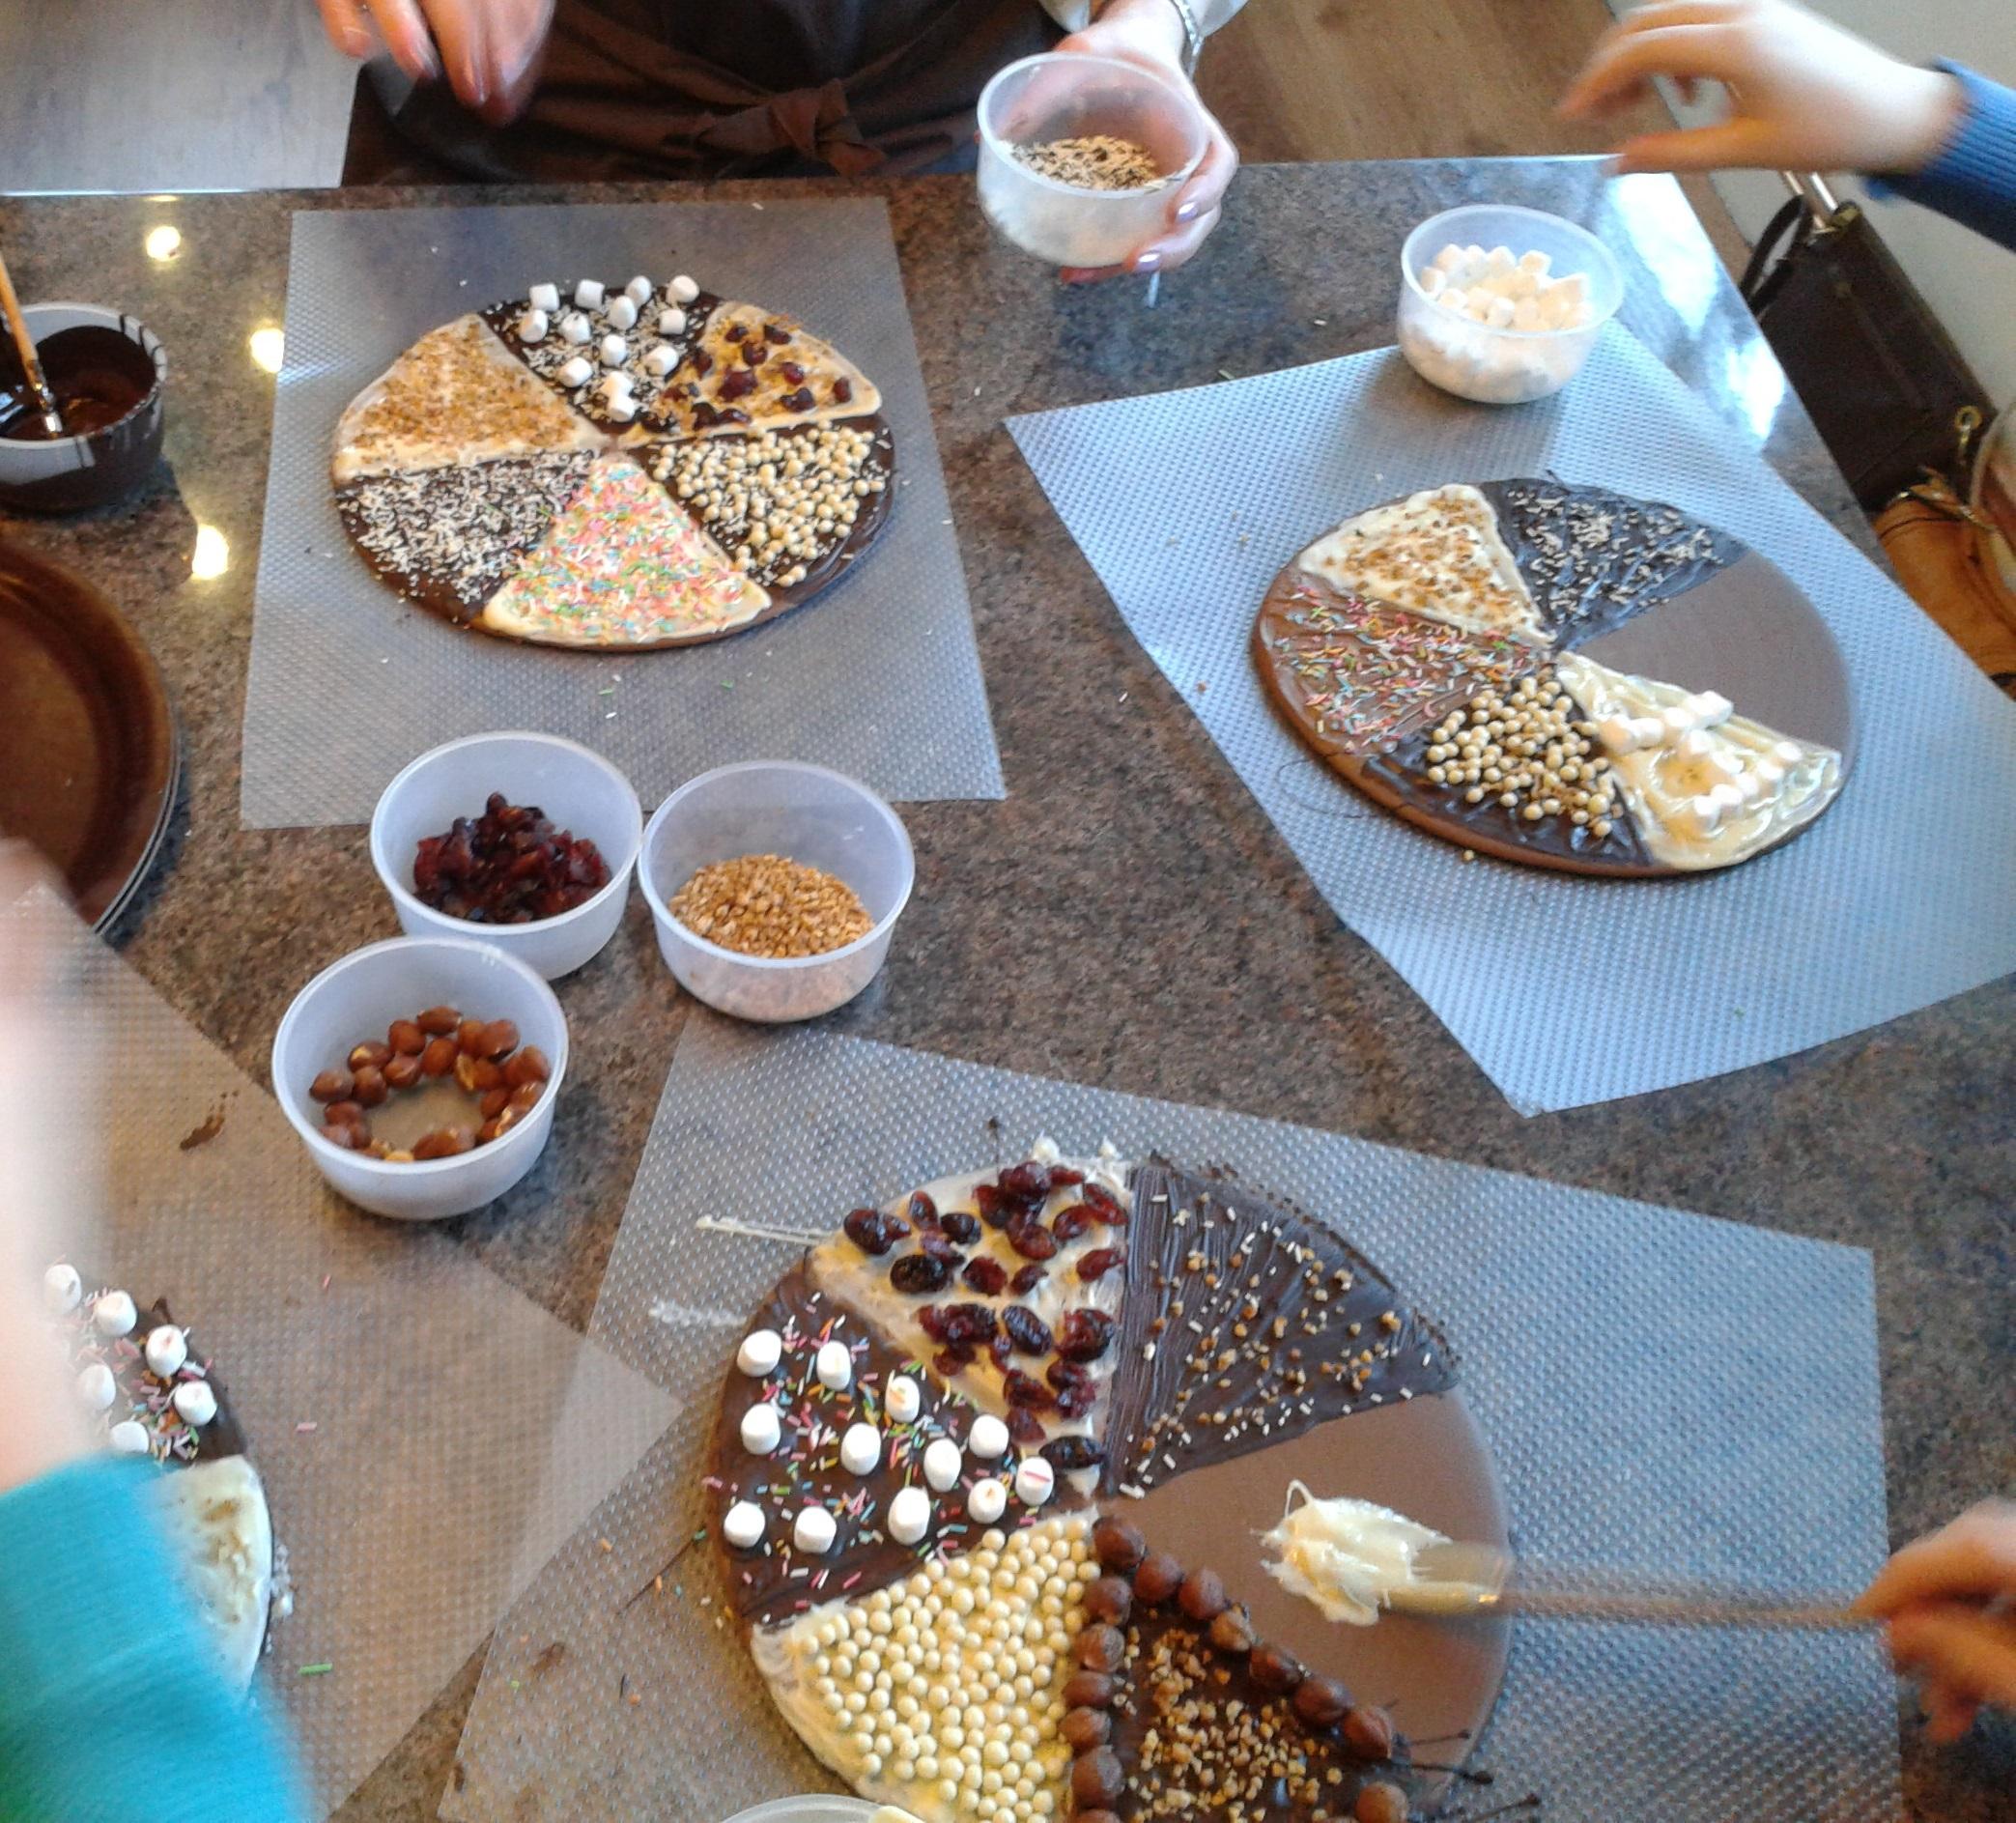 chocolatier classes chocolate course